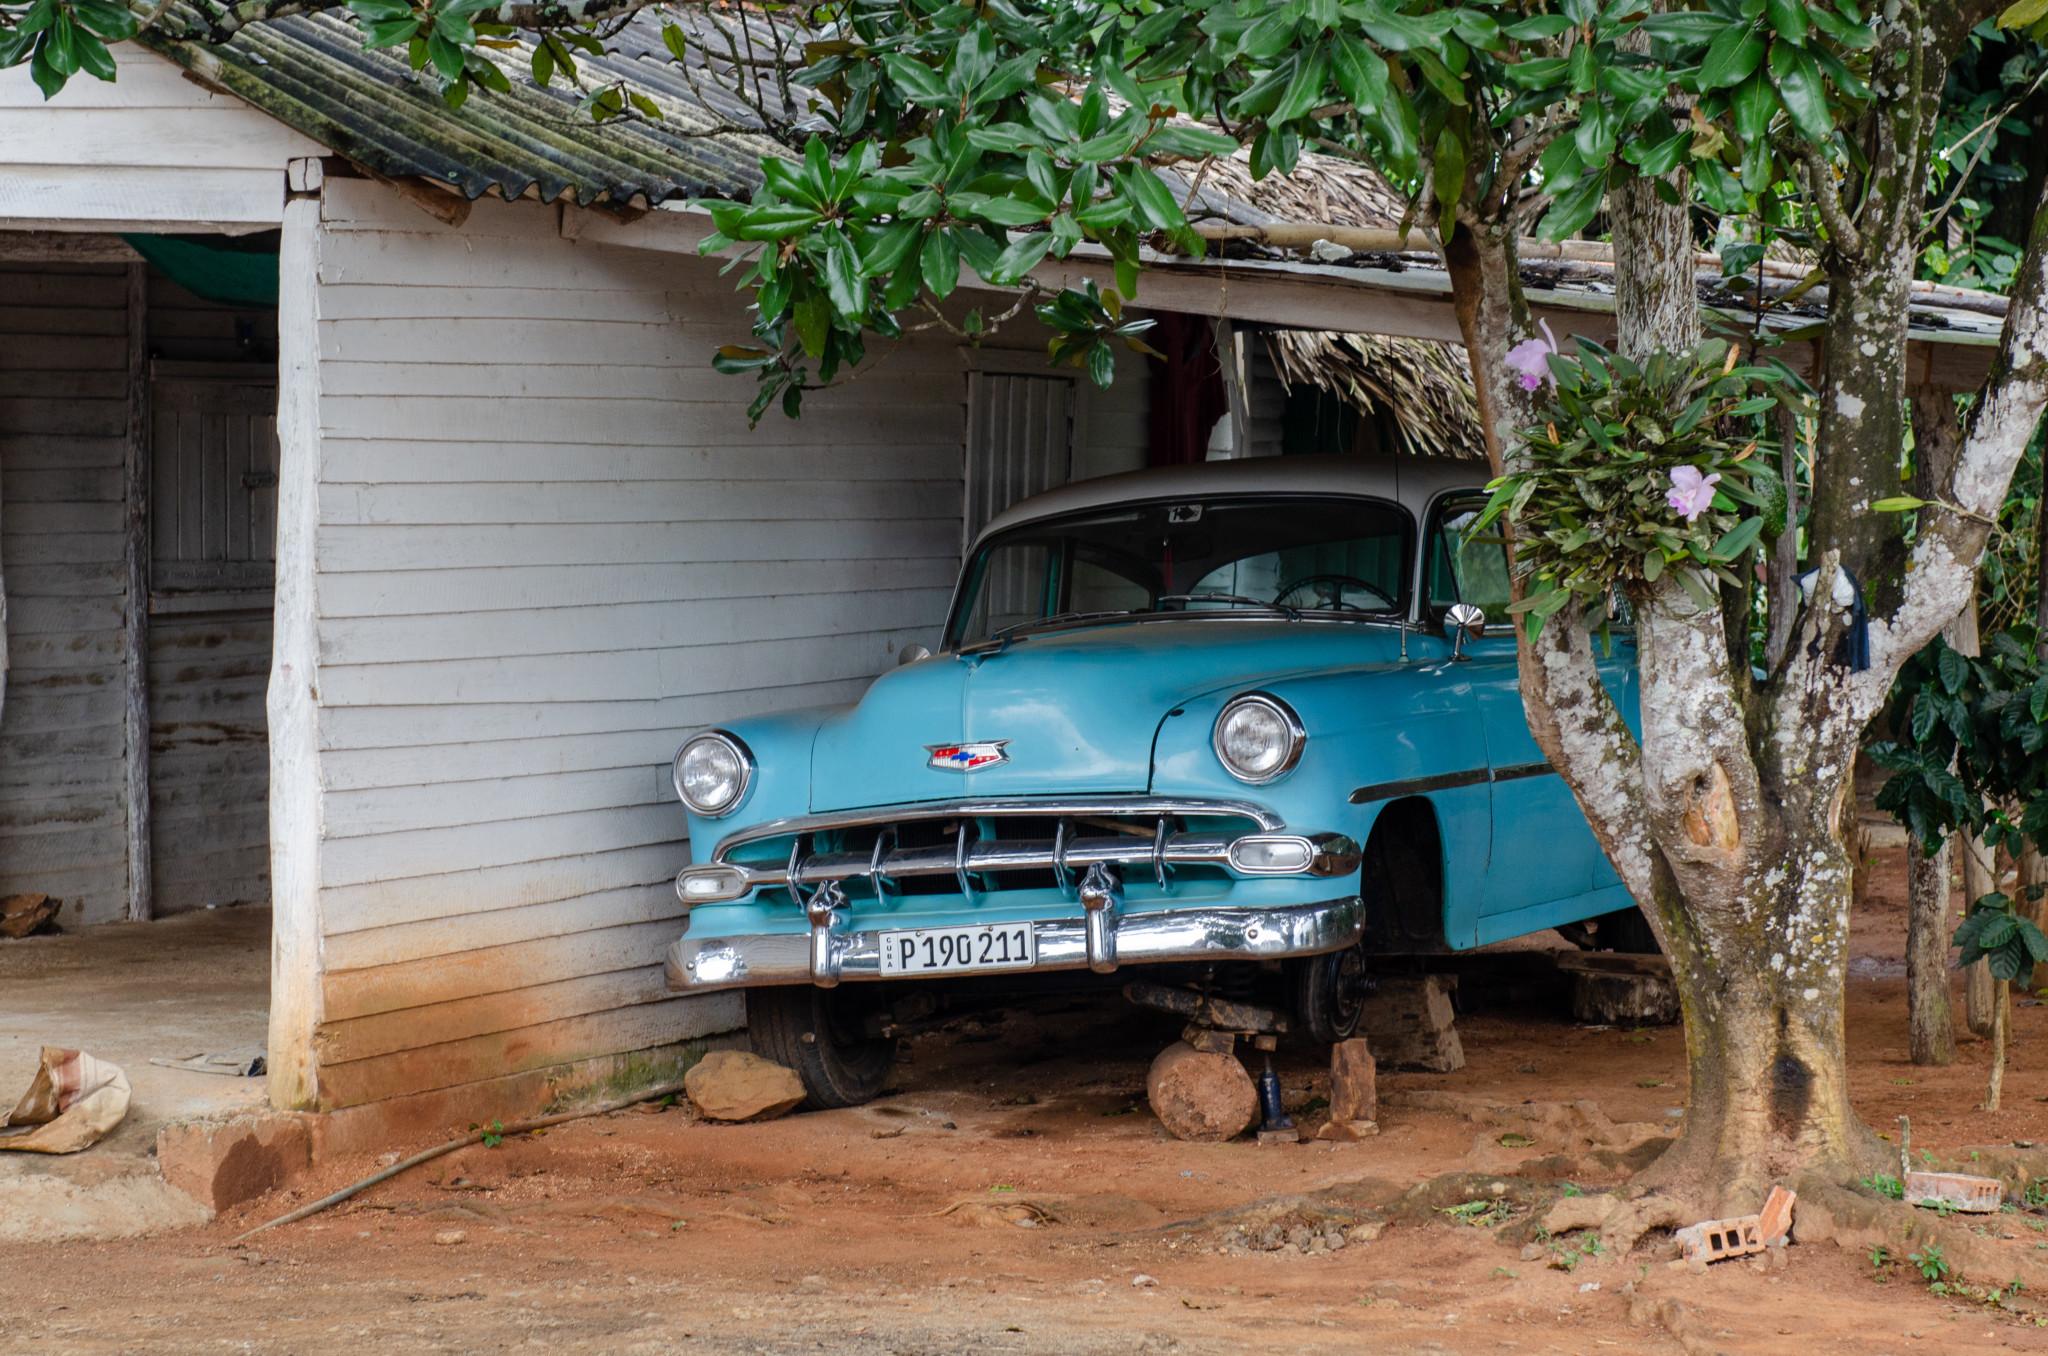 Vinales: Stopp 2 auf der Kuba Route